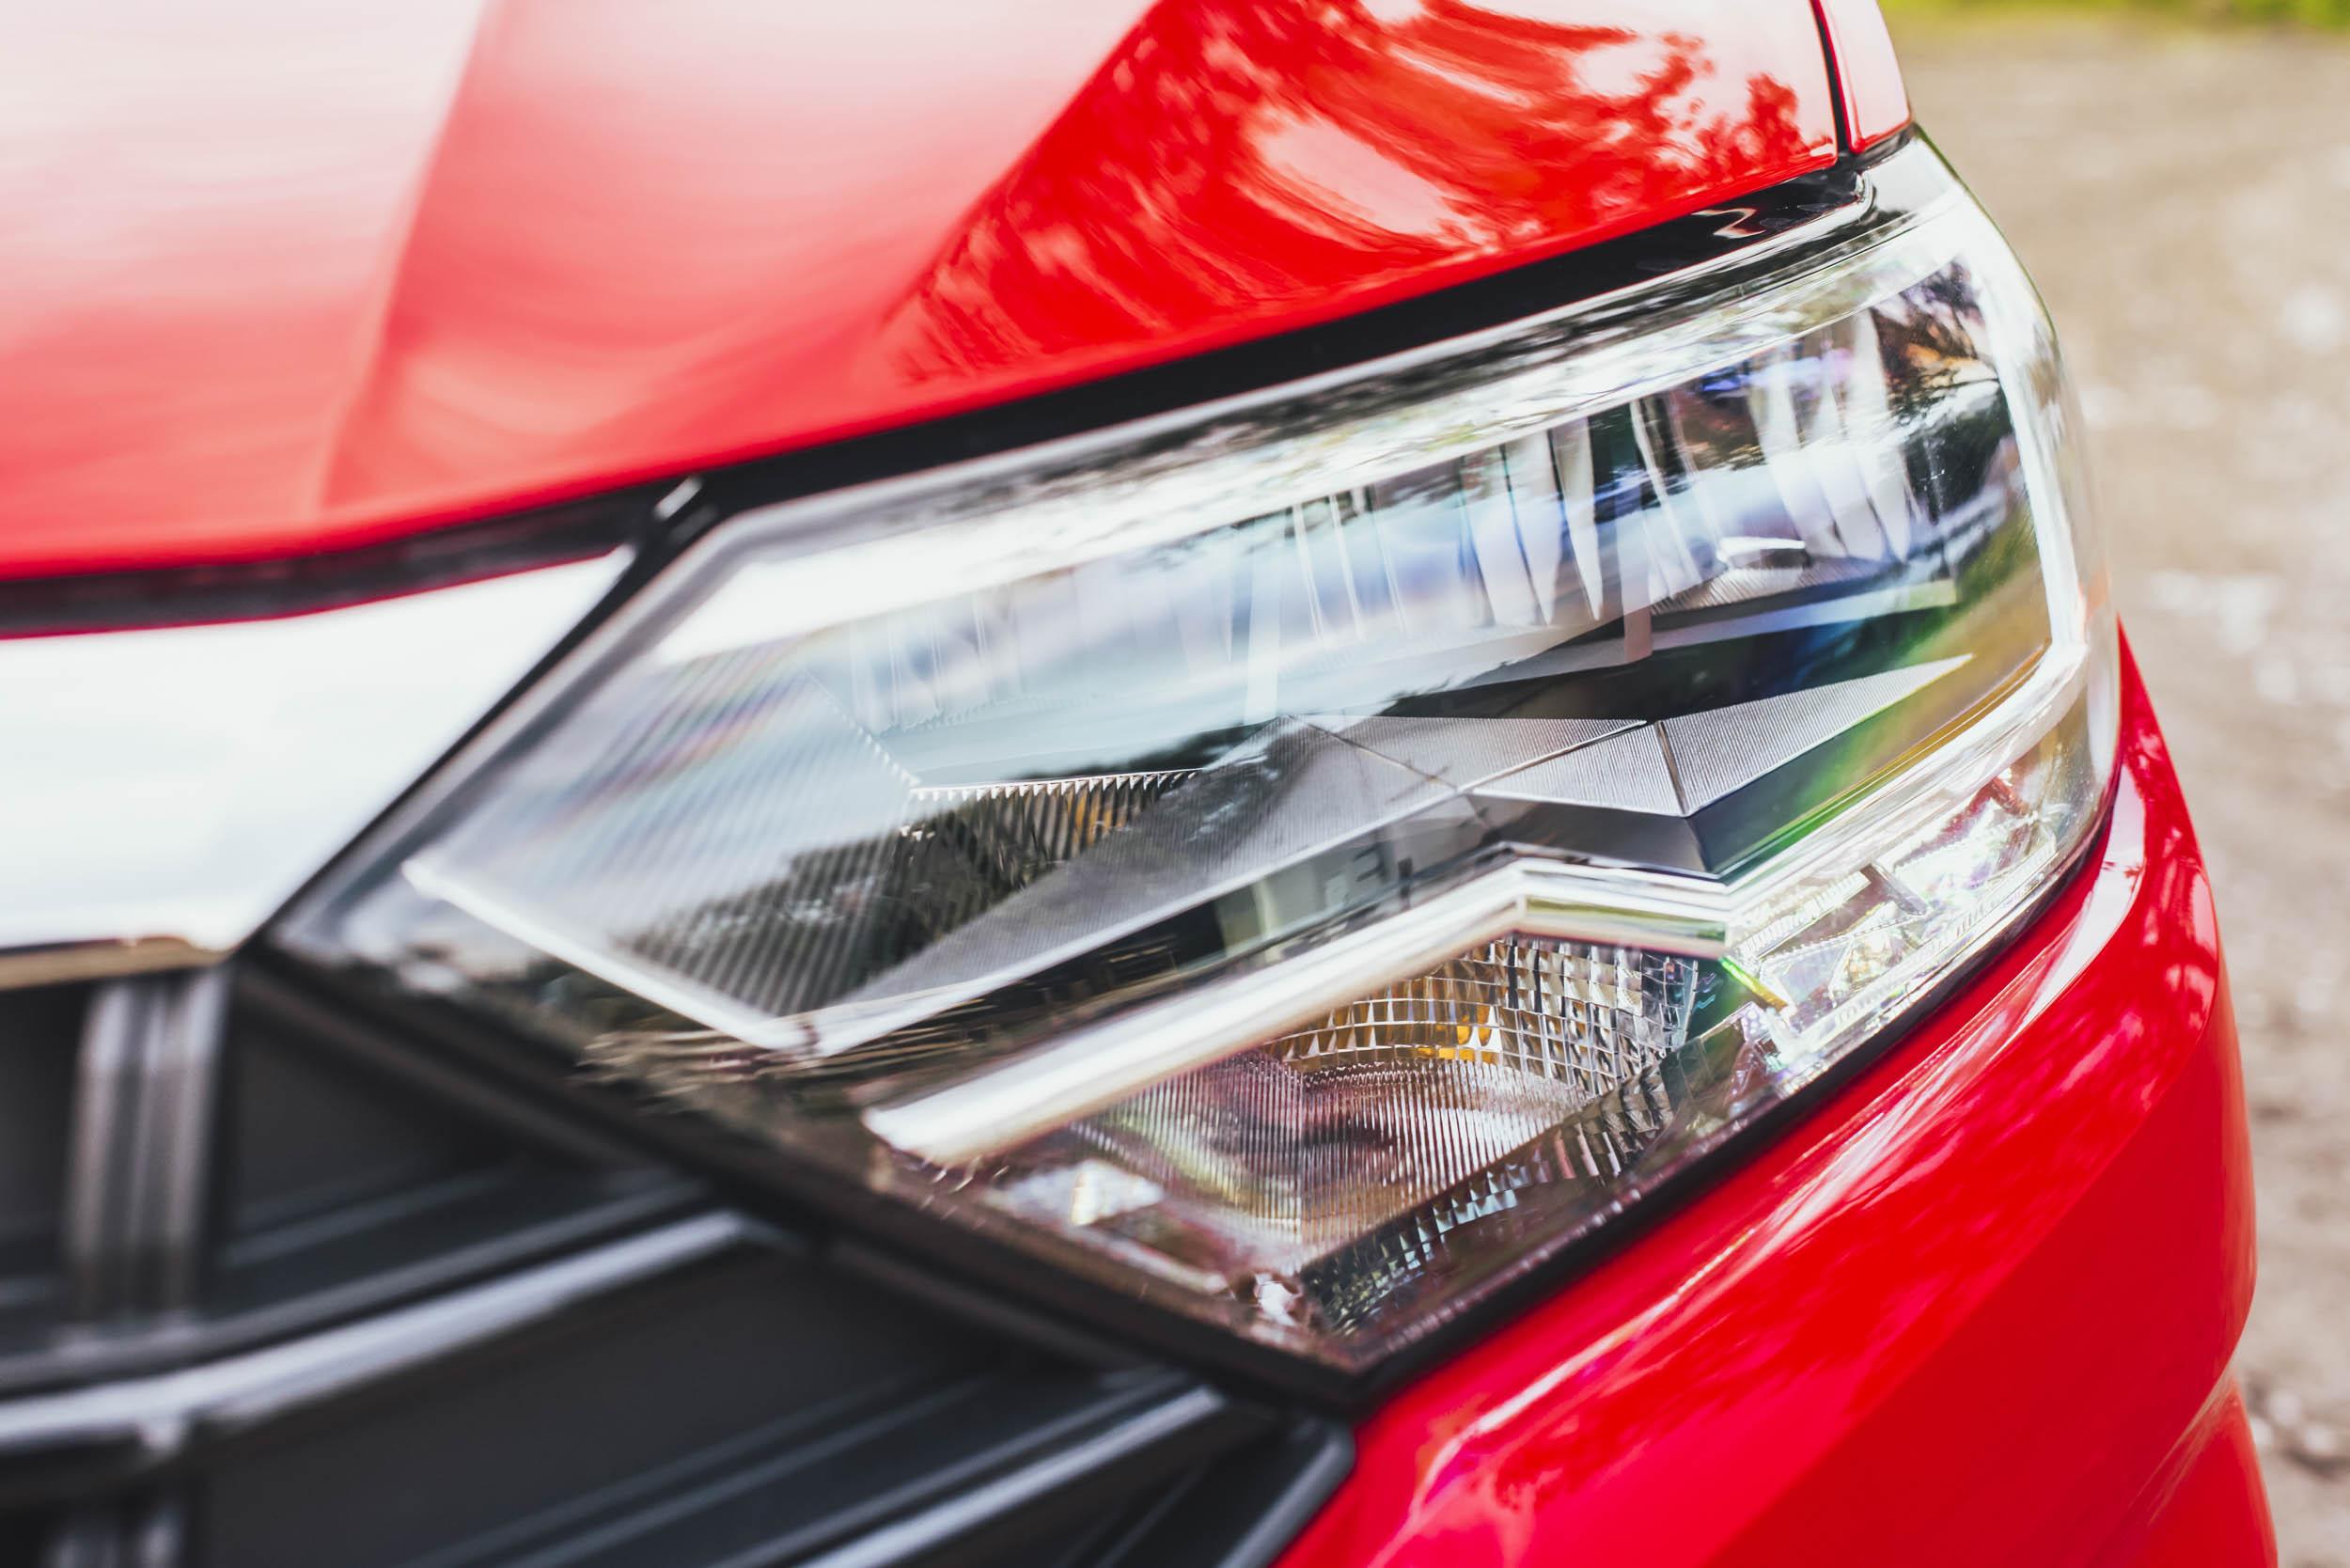 volkswagen jetta r-line headlight